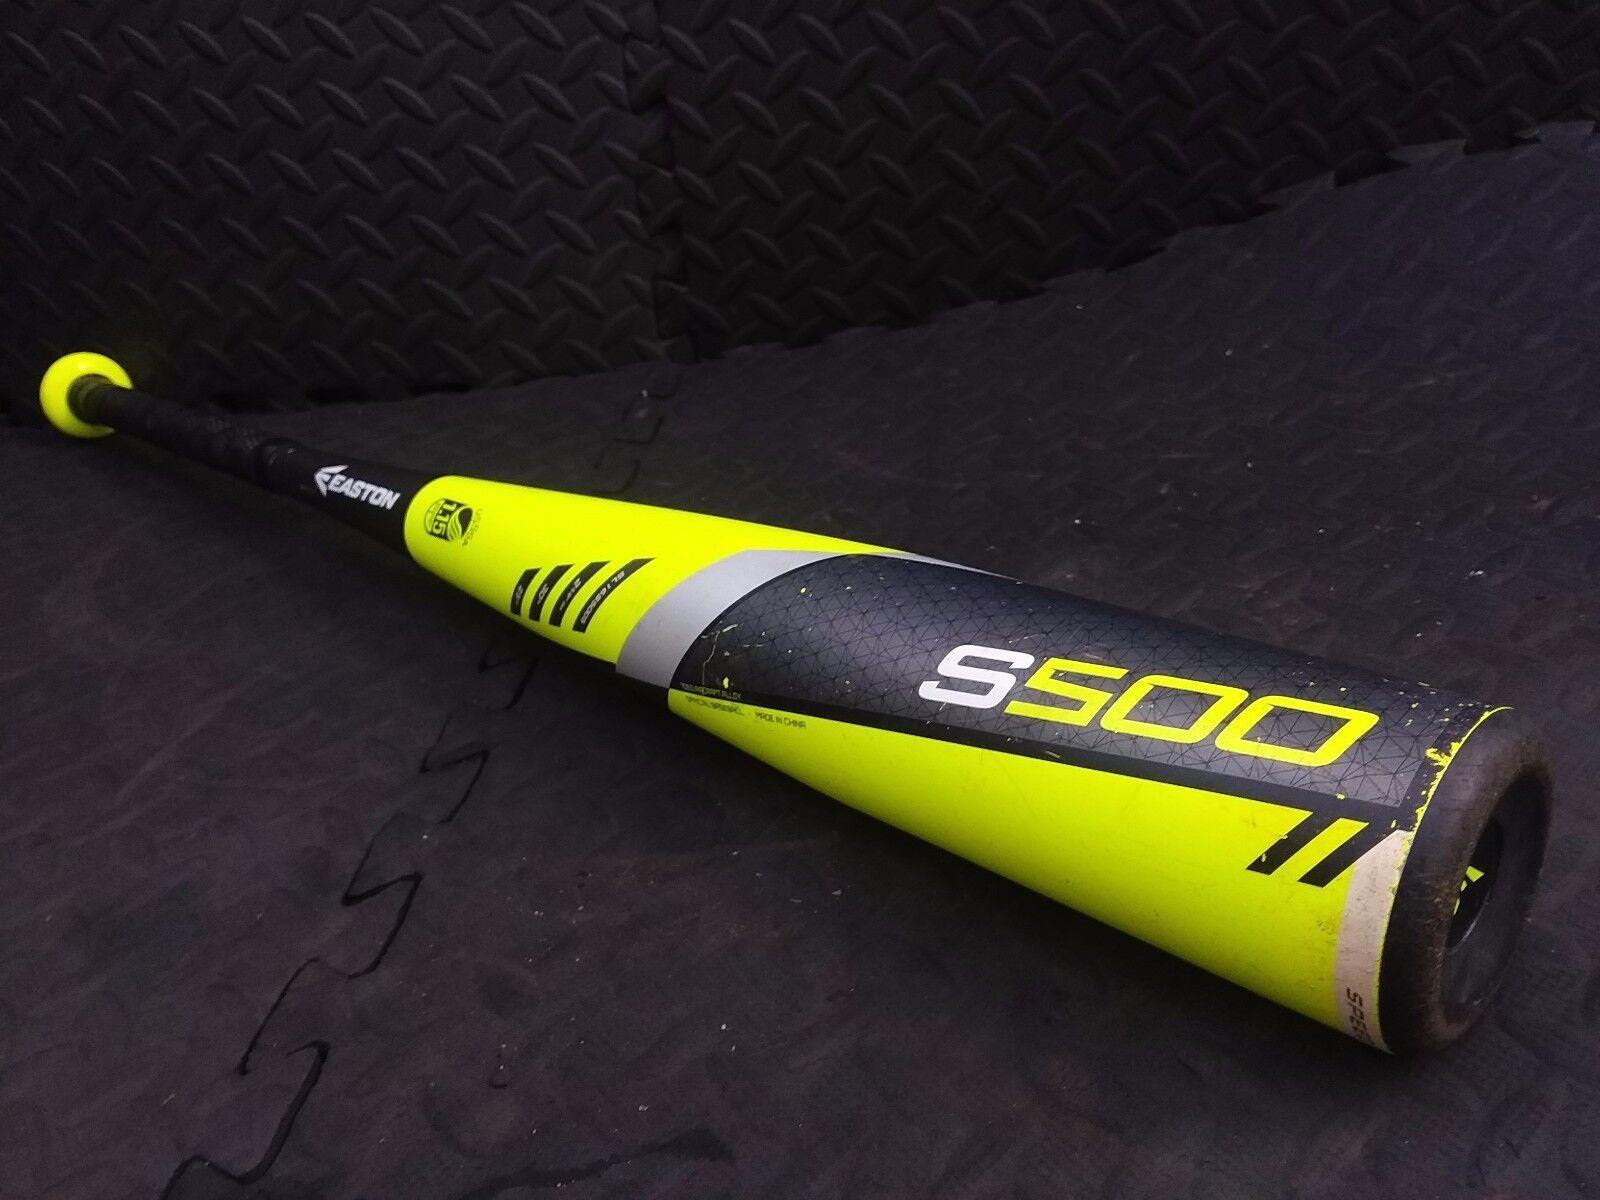 Bate Easton S500 Senior League Baseball 30 25 SL16S5005 (-5) 2 5 8  barril usssa